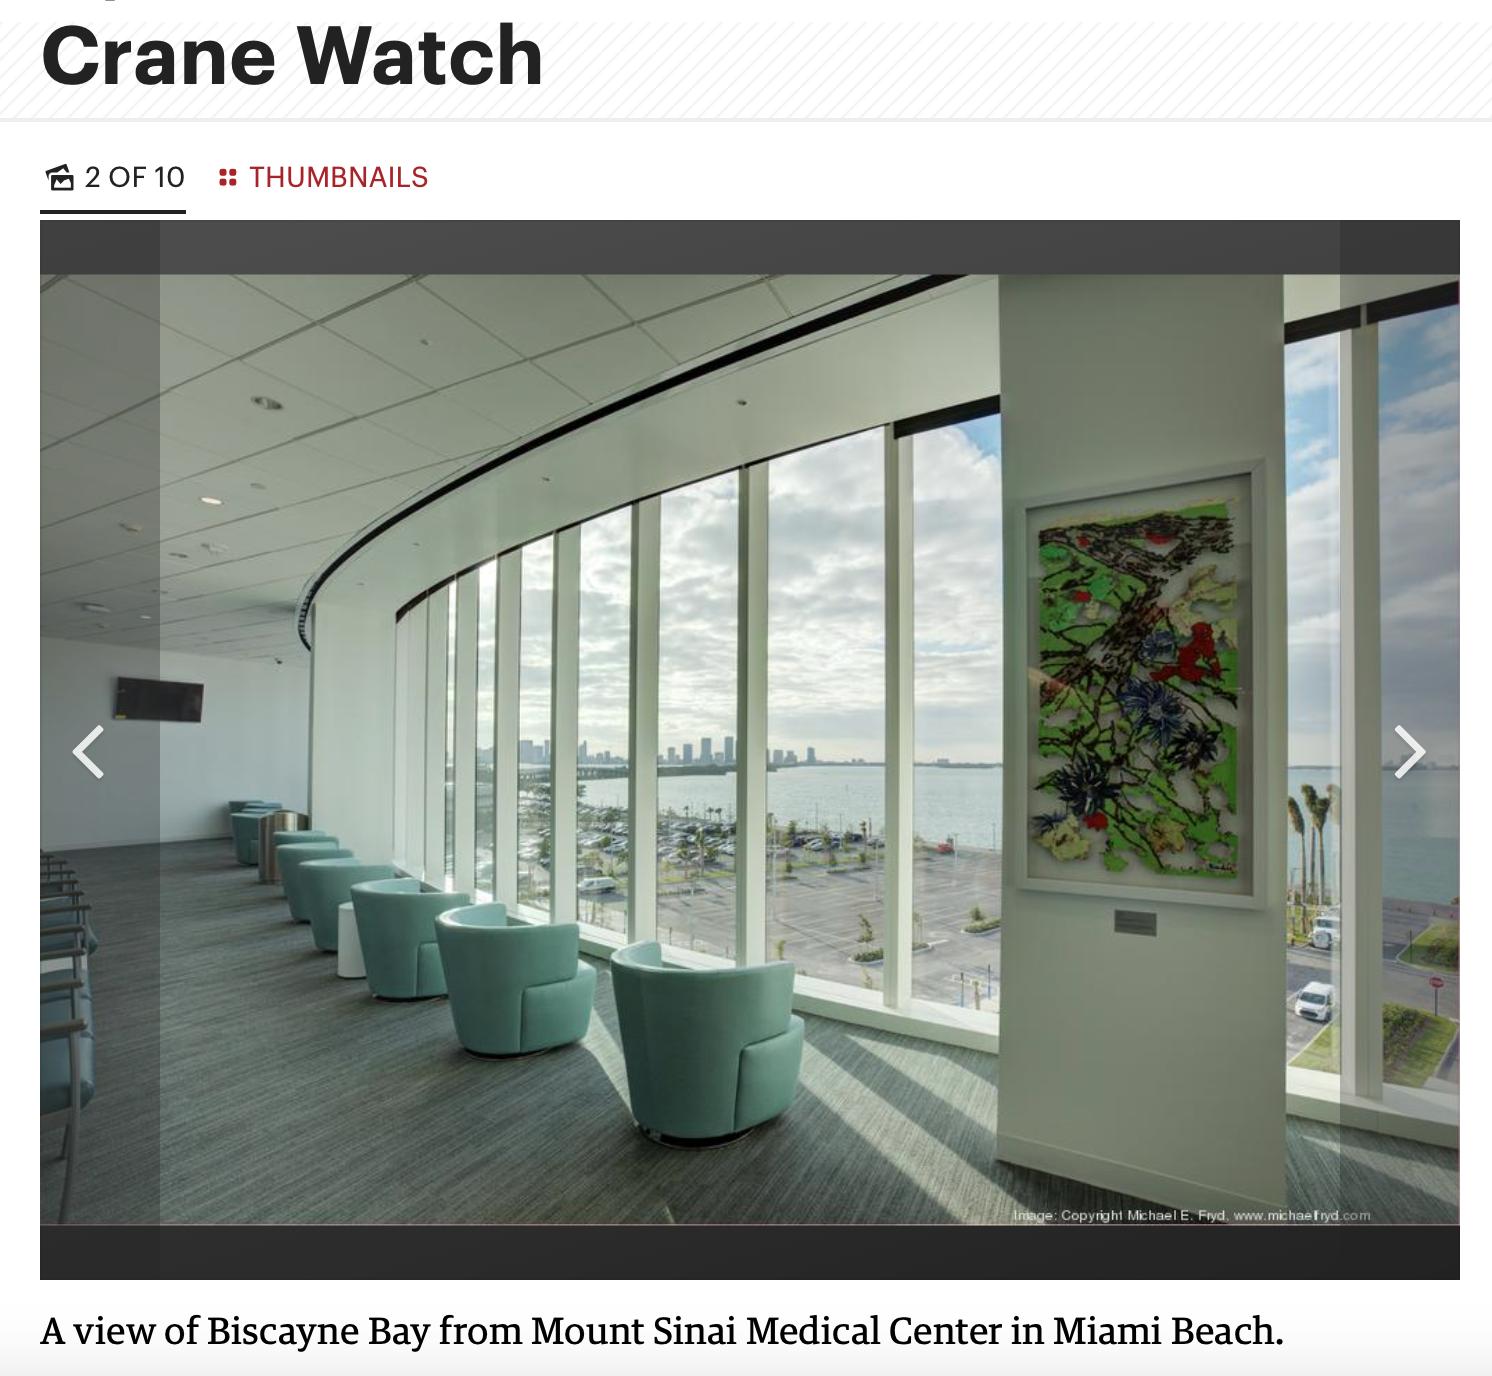 Mount Sinai Medical Center completes $275M expansion — MIRA LEHR